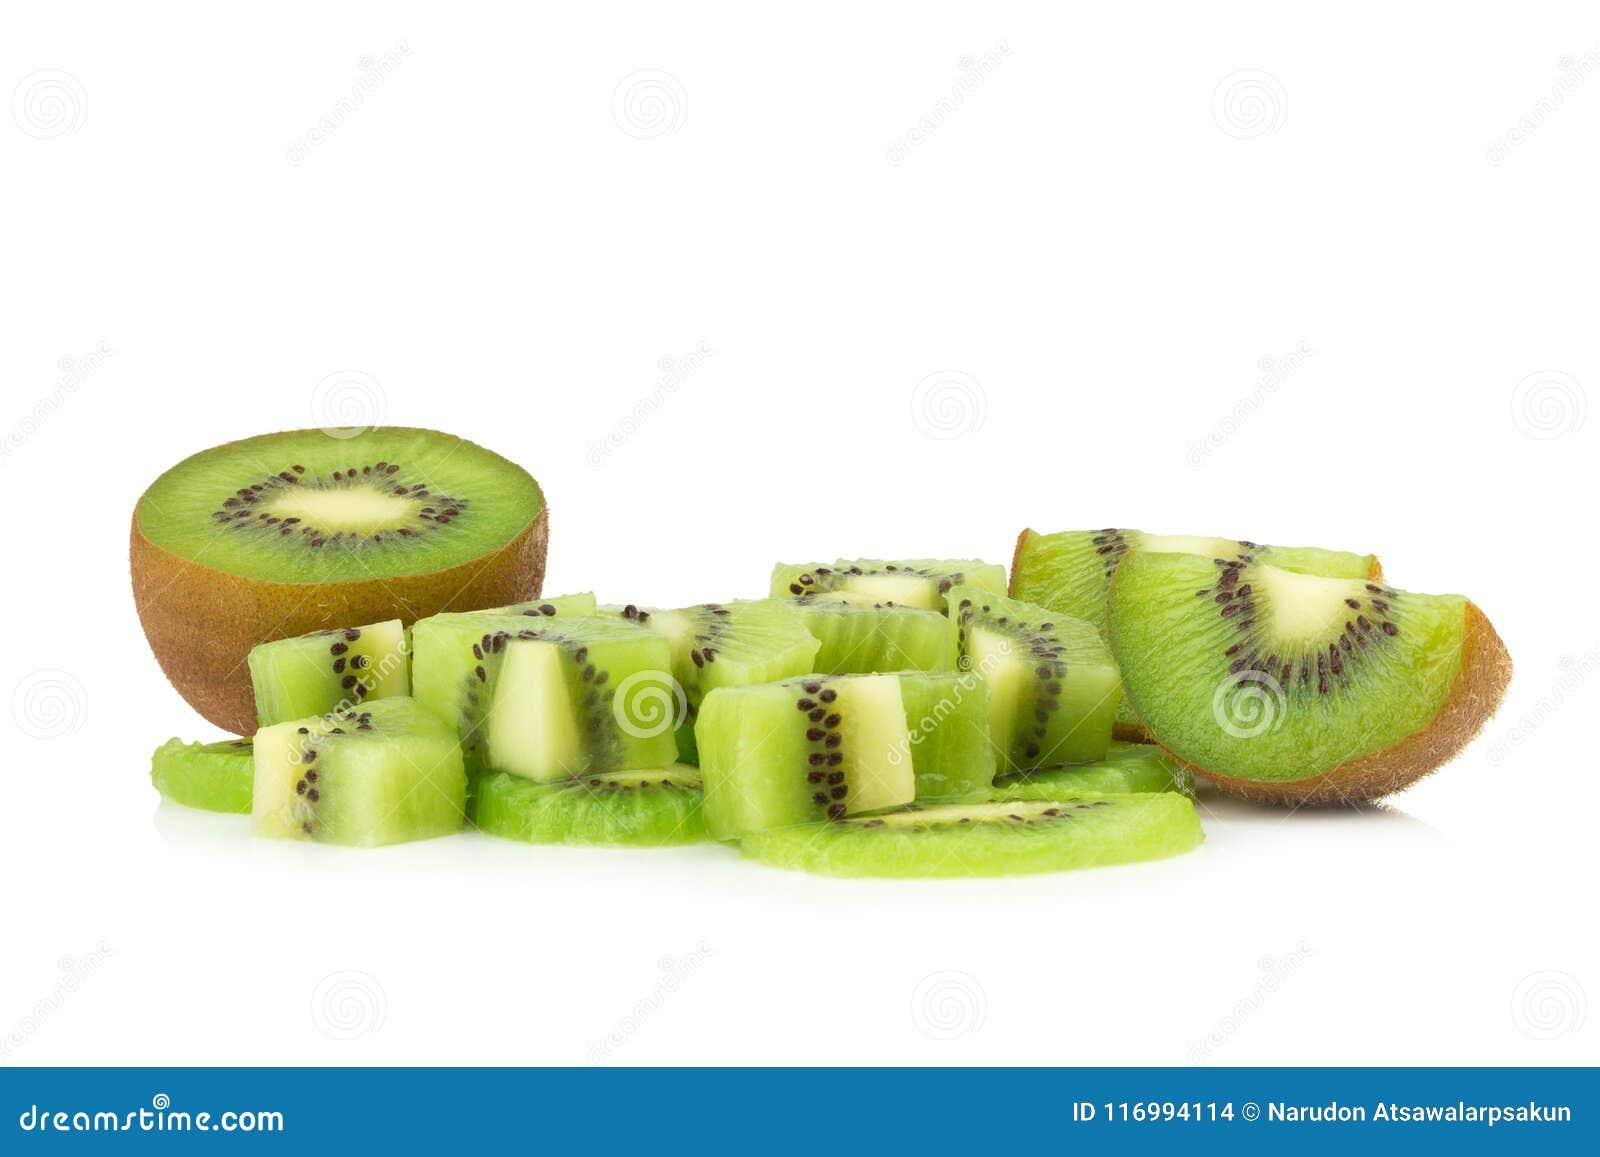 Kiwivruchten stuk plak half Geïsoleerdj op witte achtergrond